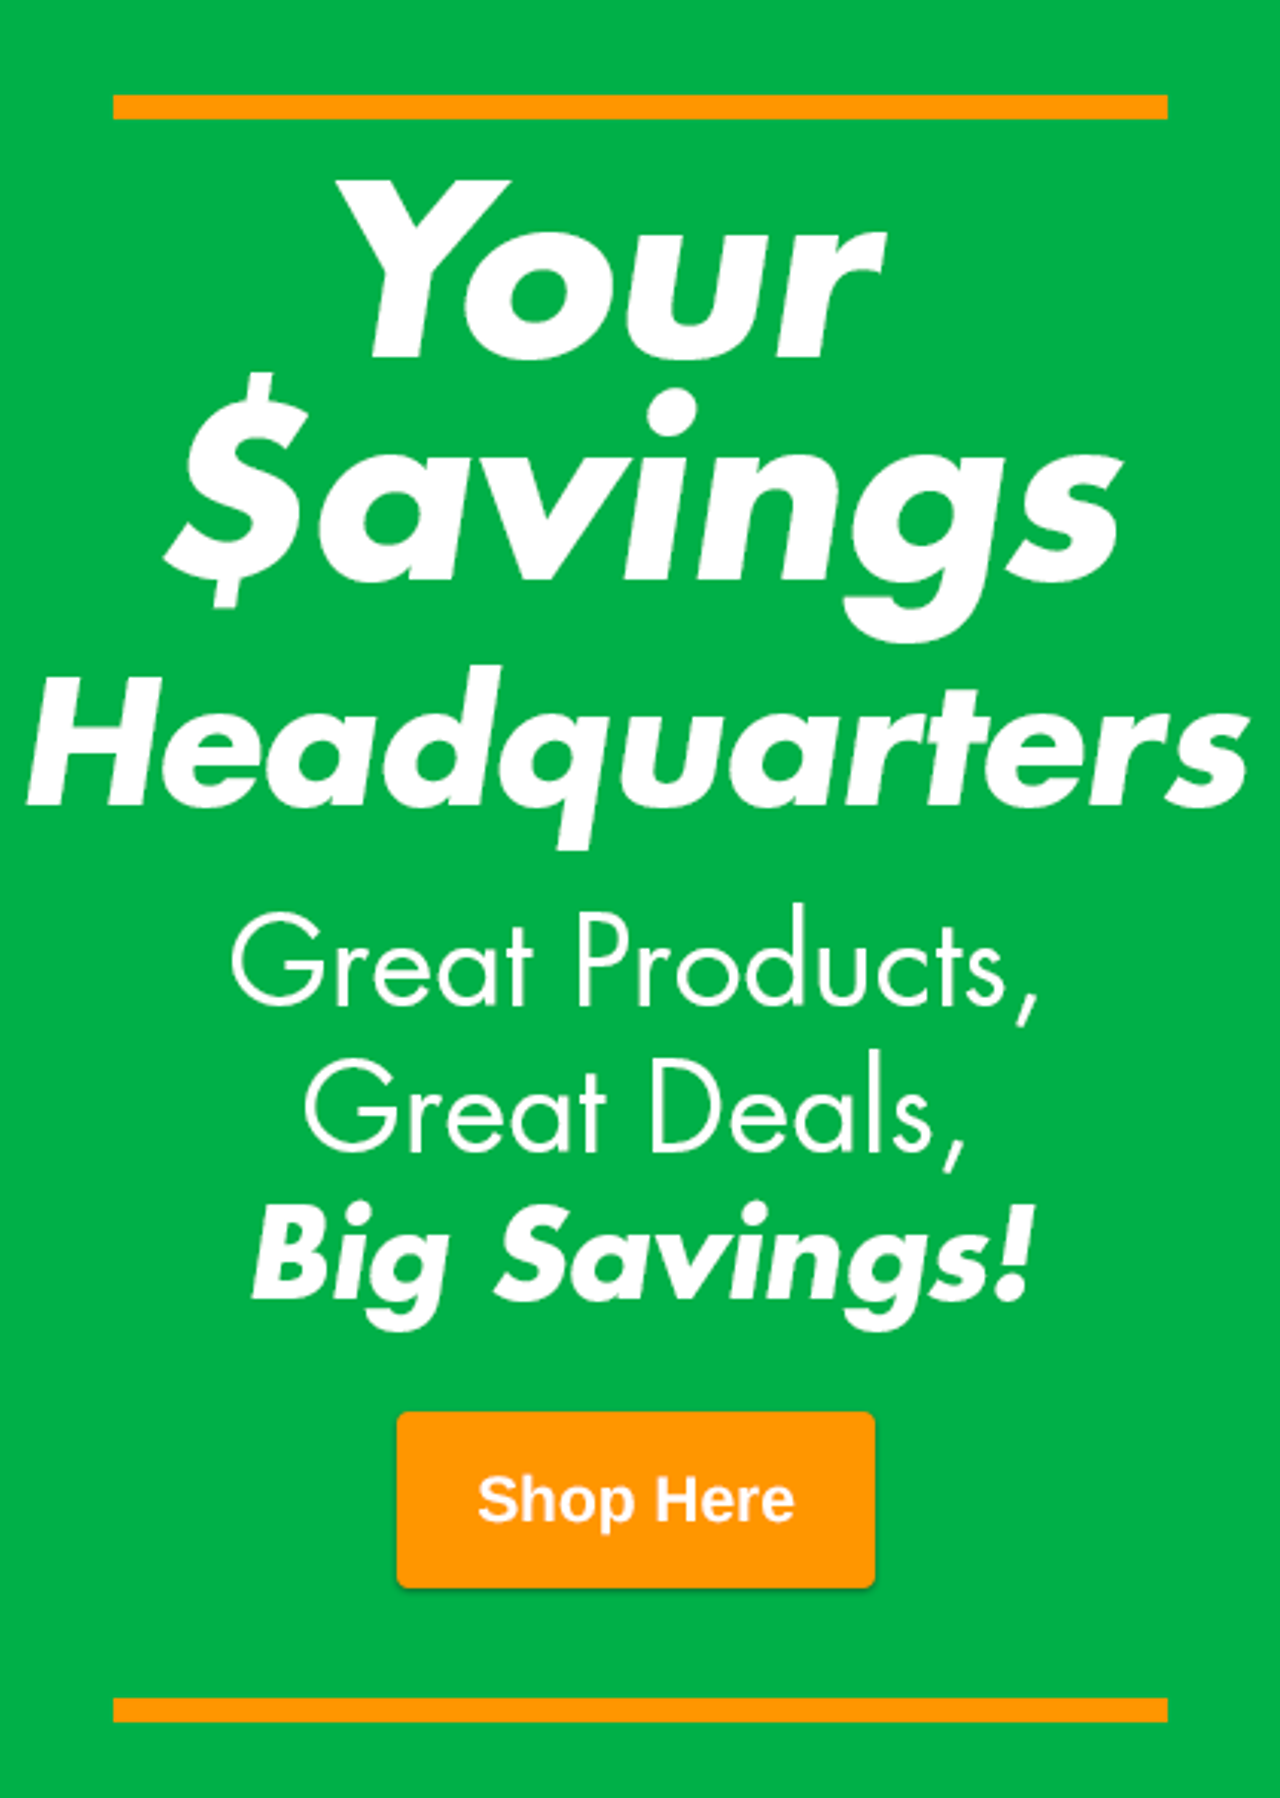 Savings Headquarters Image